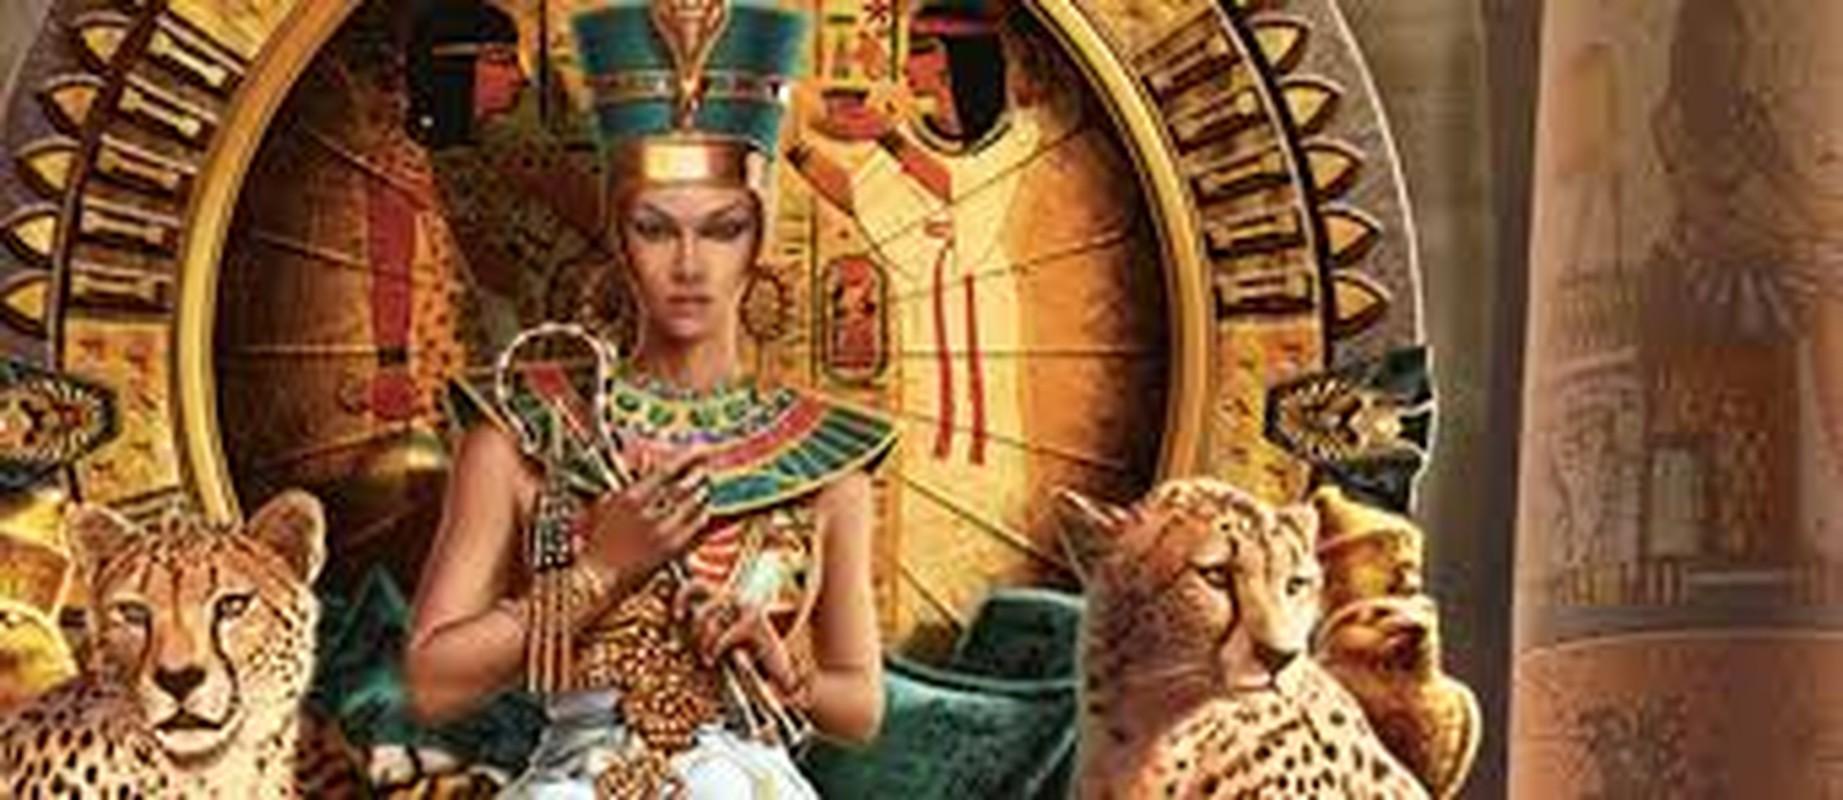 Loi giai chan dong ve noi chon cat Nu hoang Cleopatra-Hinh-9